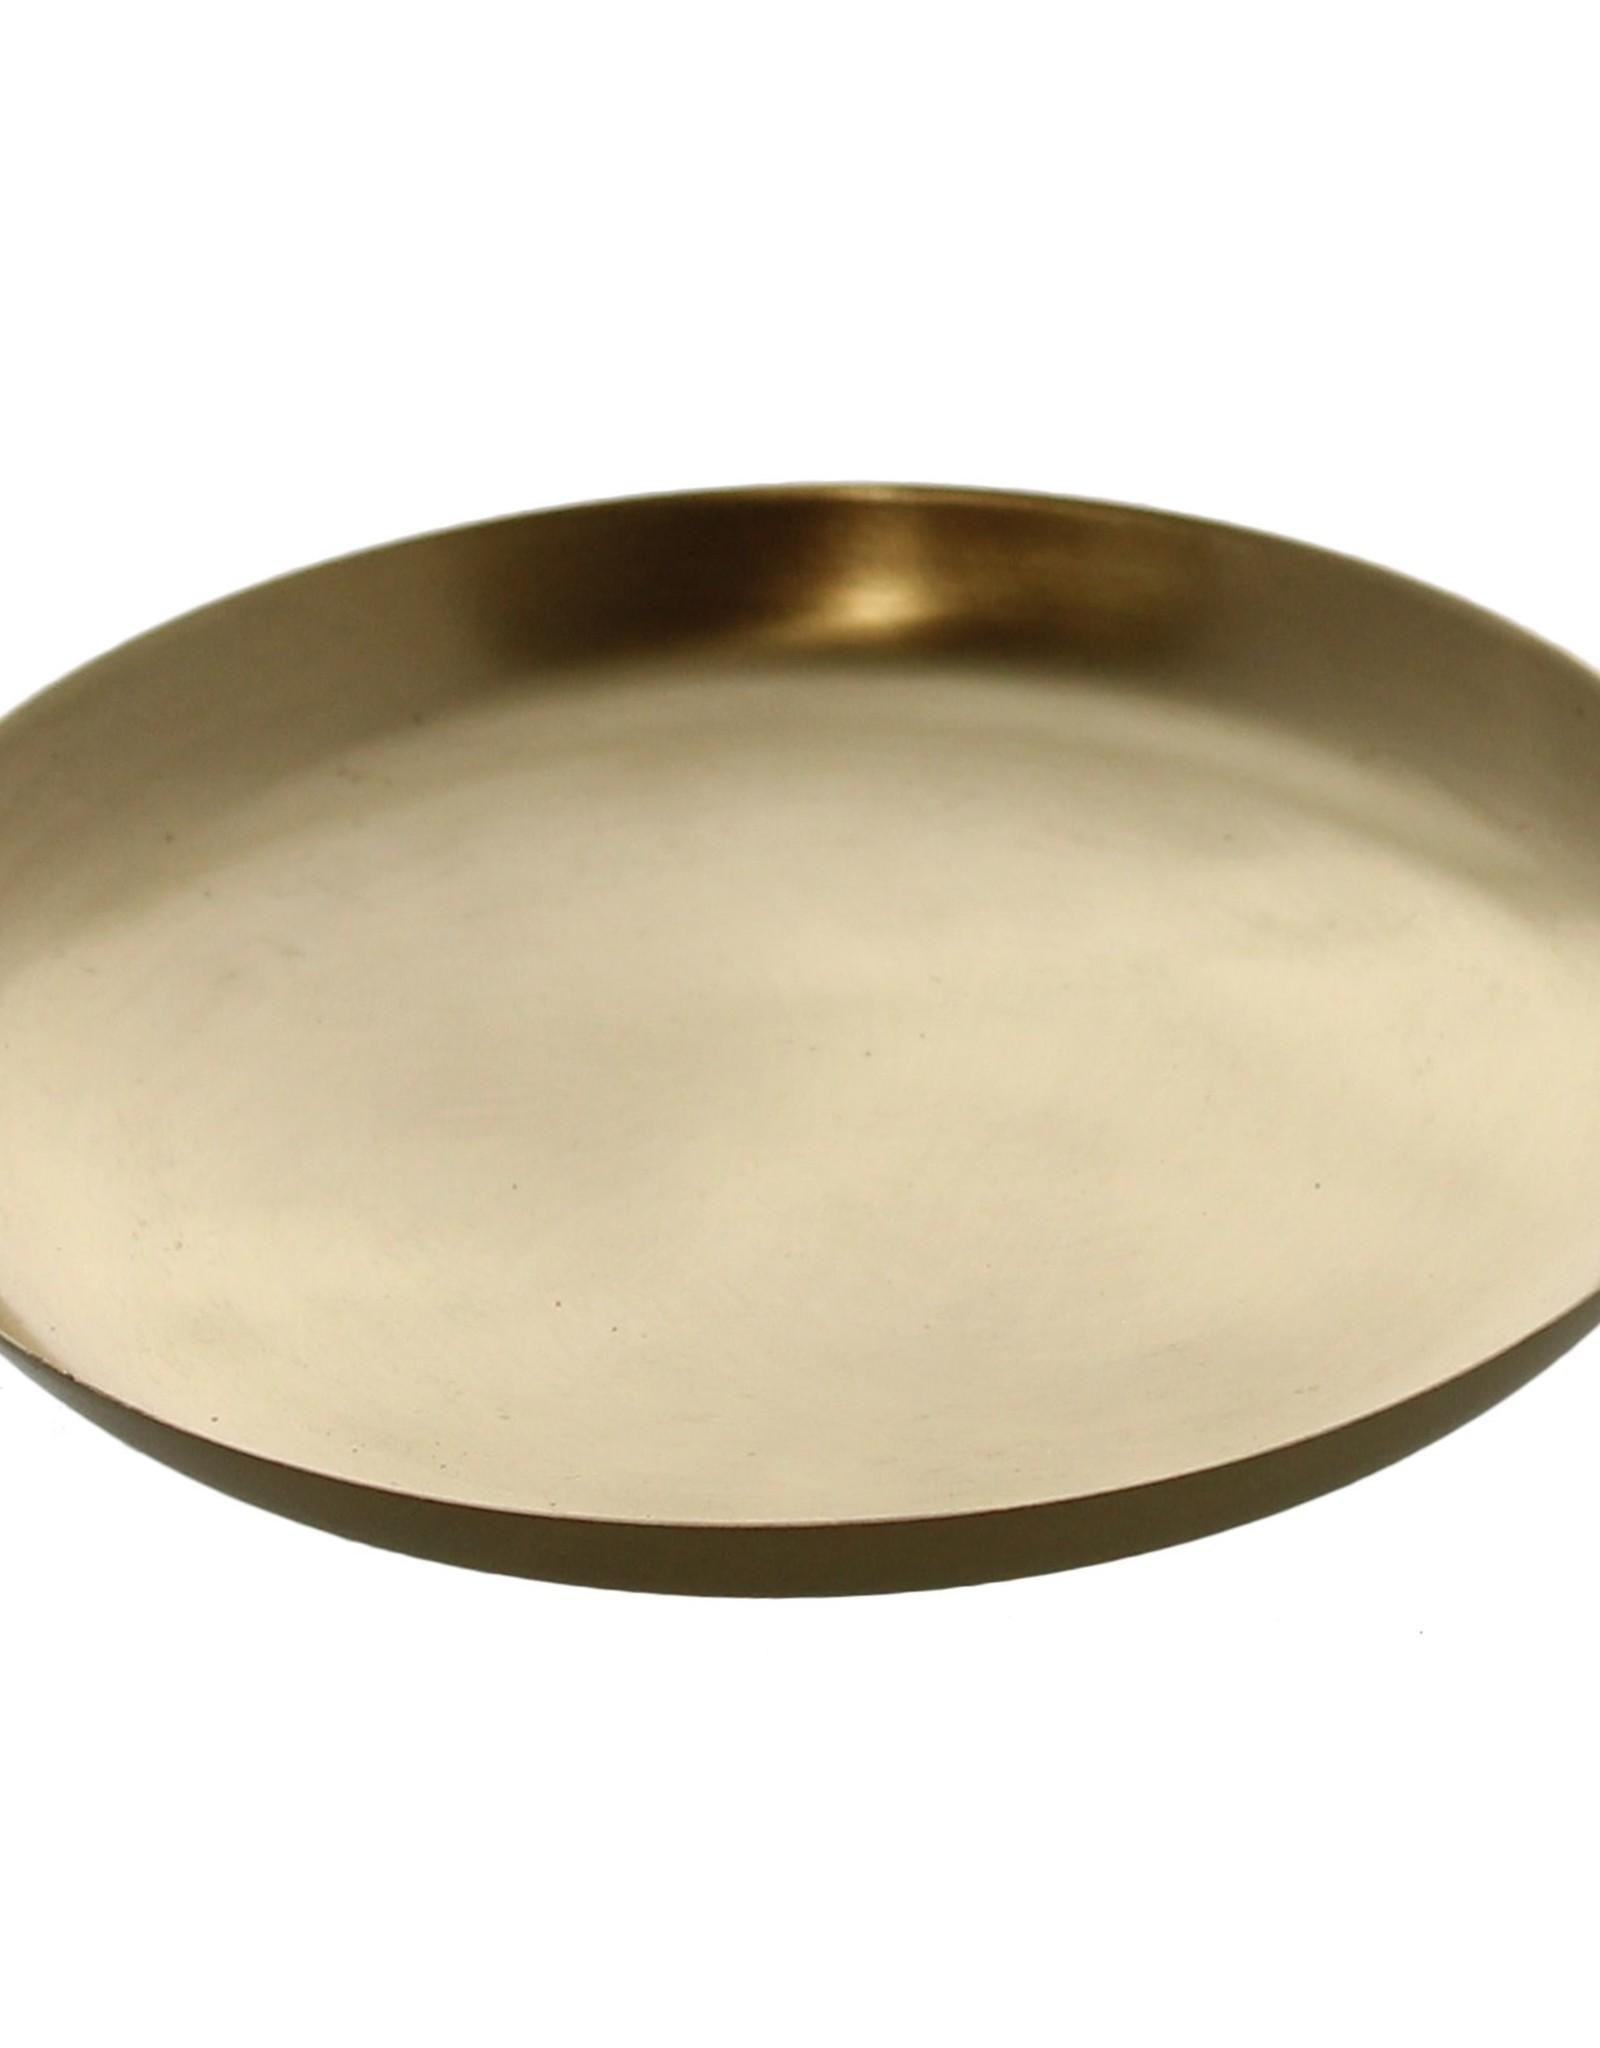 Large Brushed Brass Tray